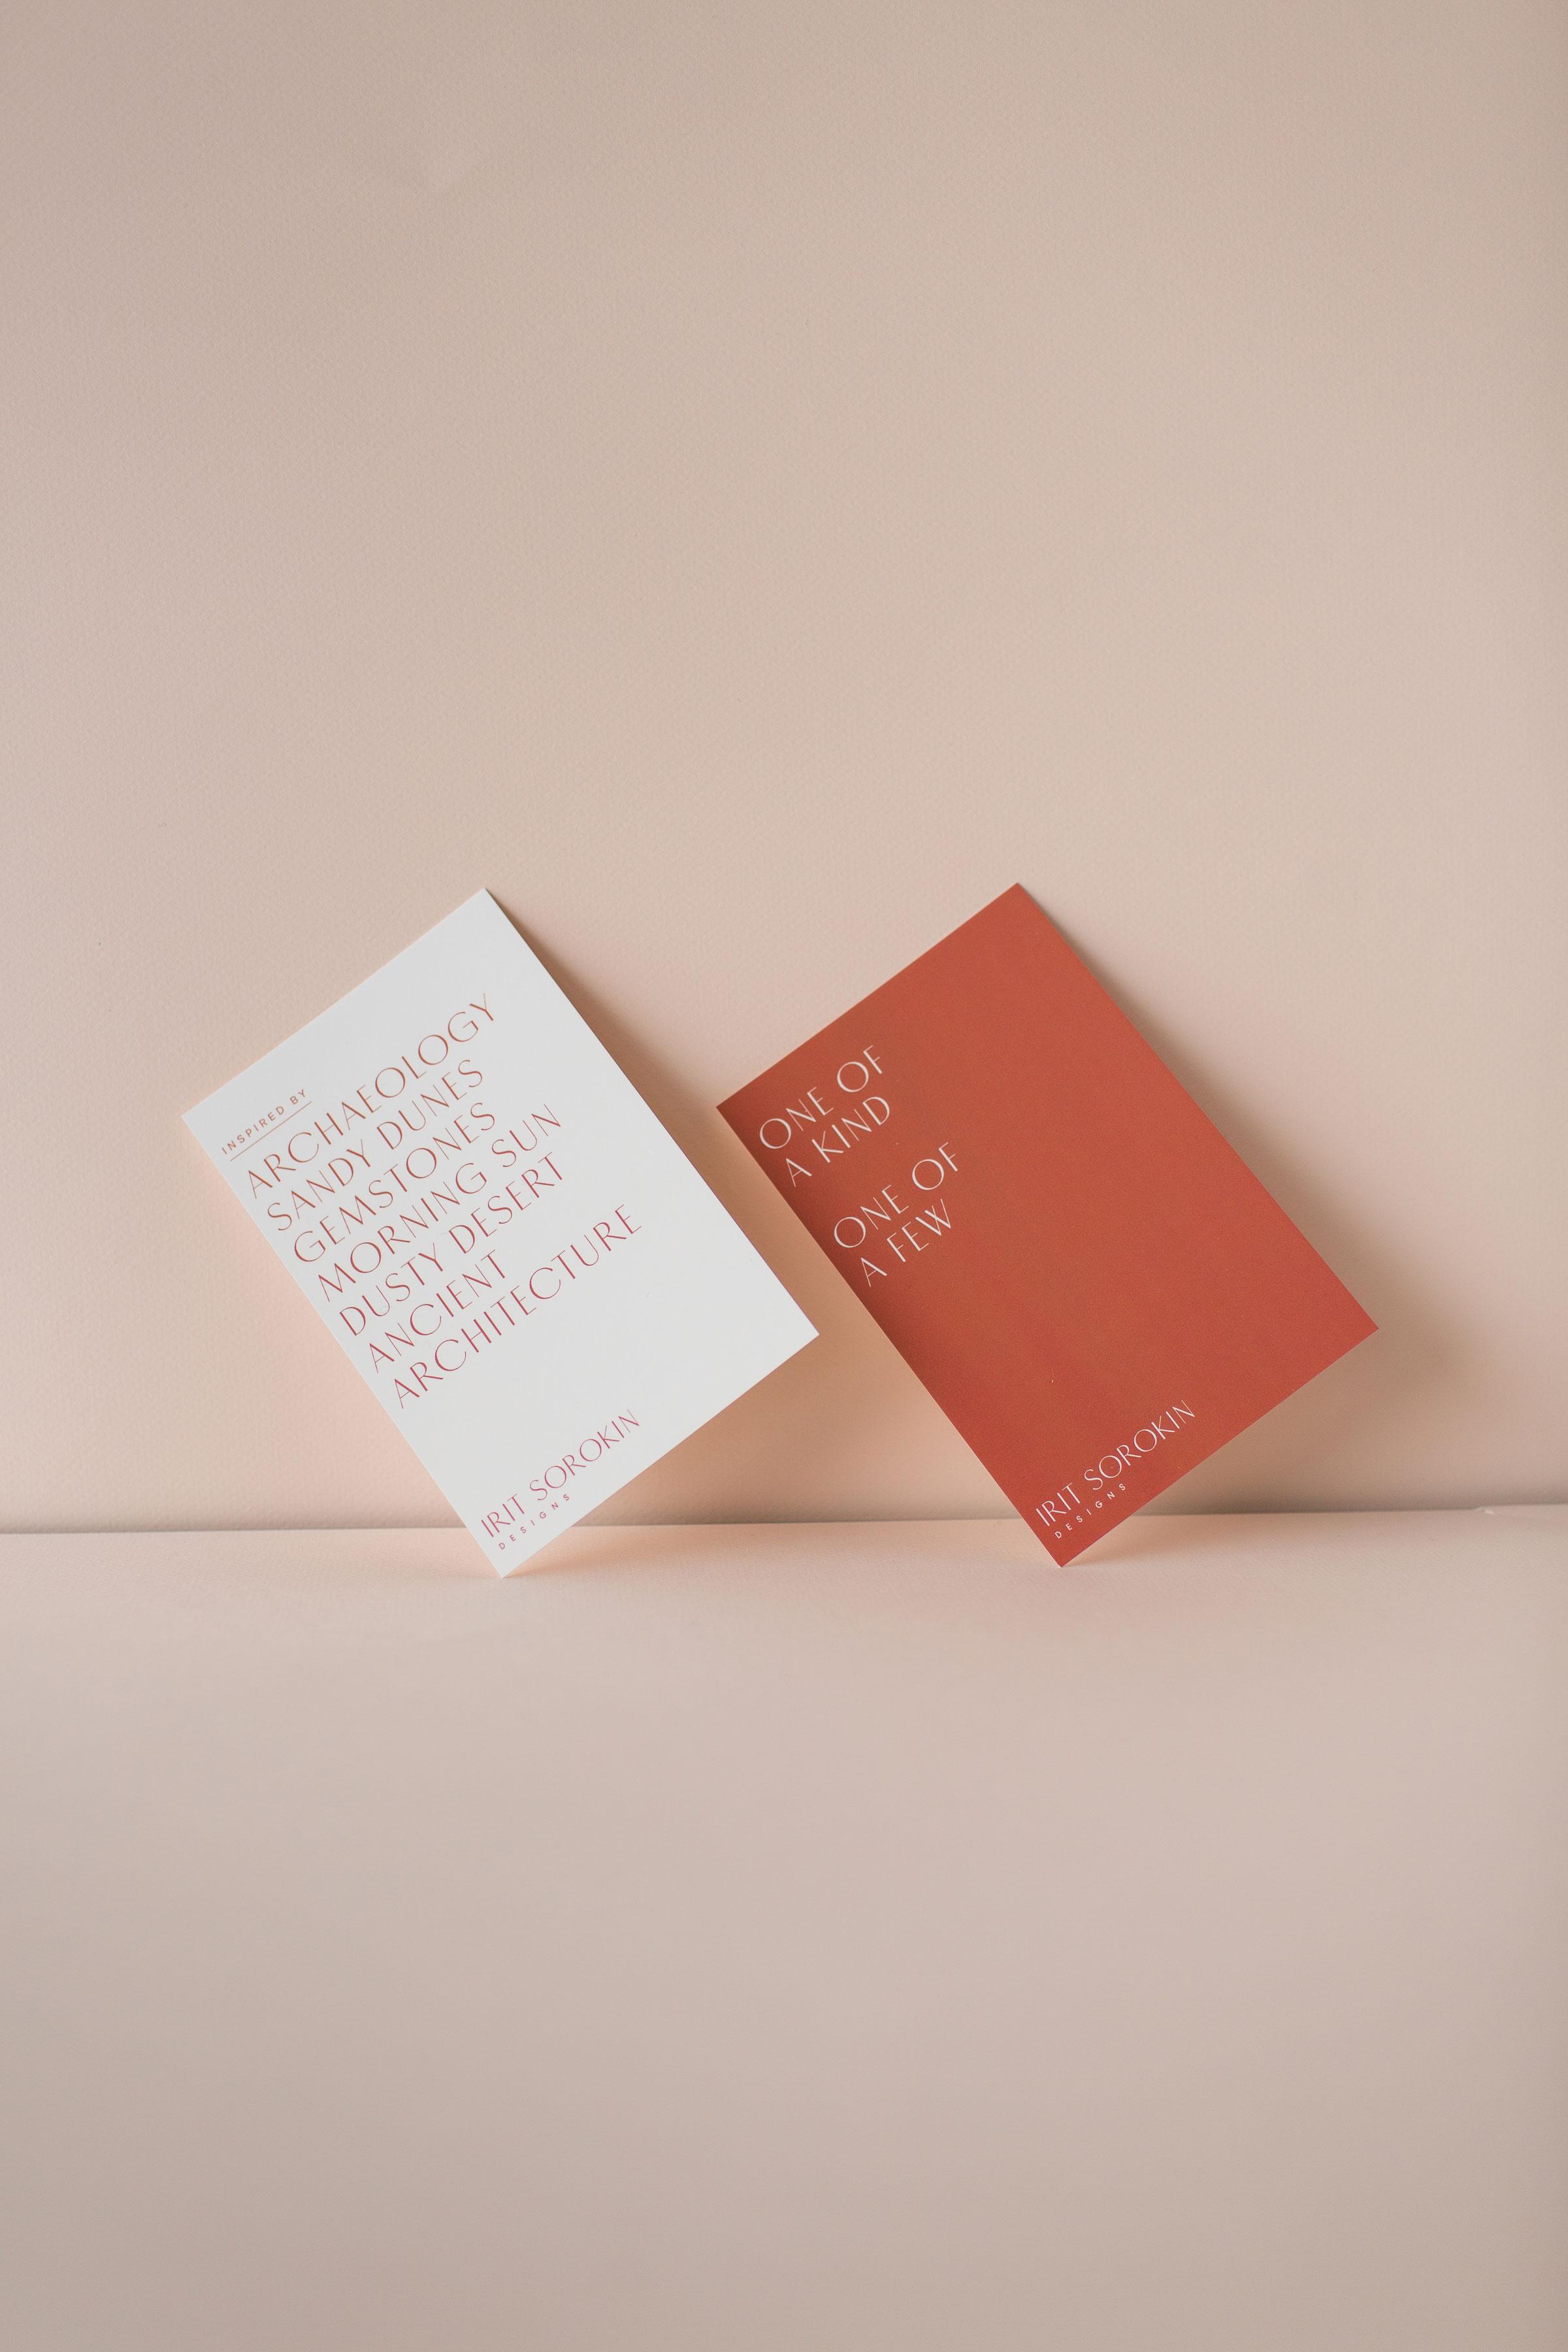 Irit Sorokin Jewellery printed Postcard Design | www.alicia-carvalho.com